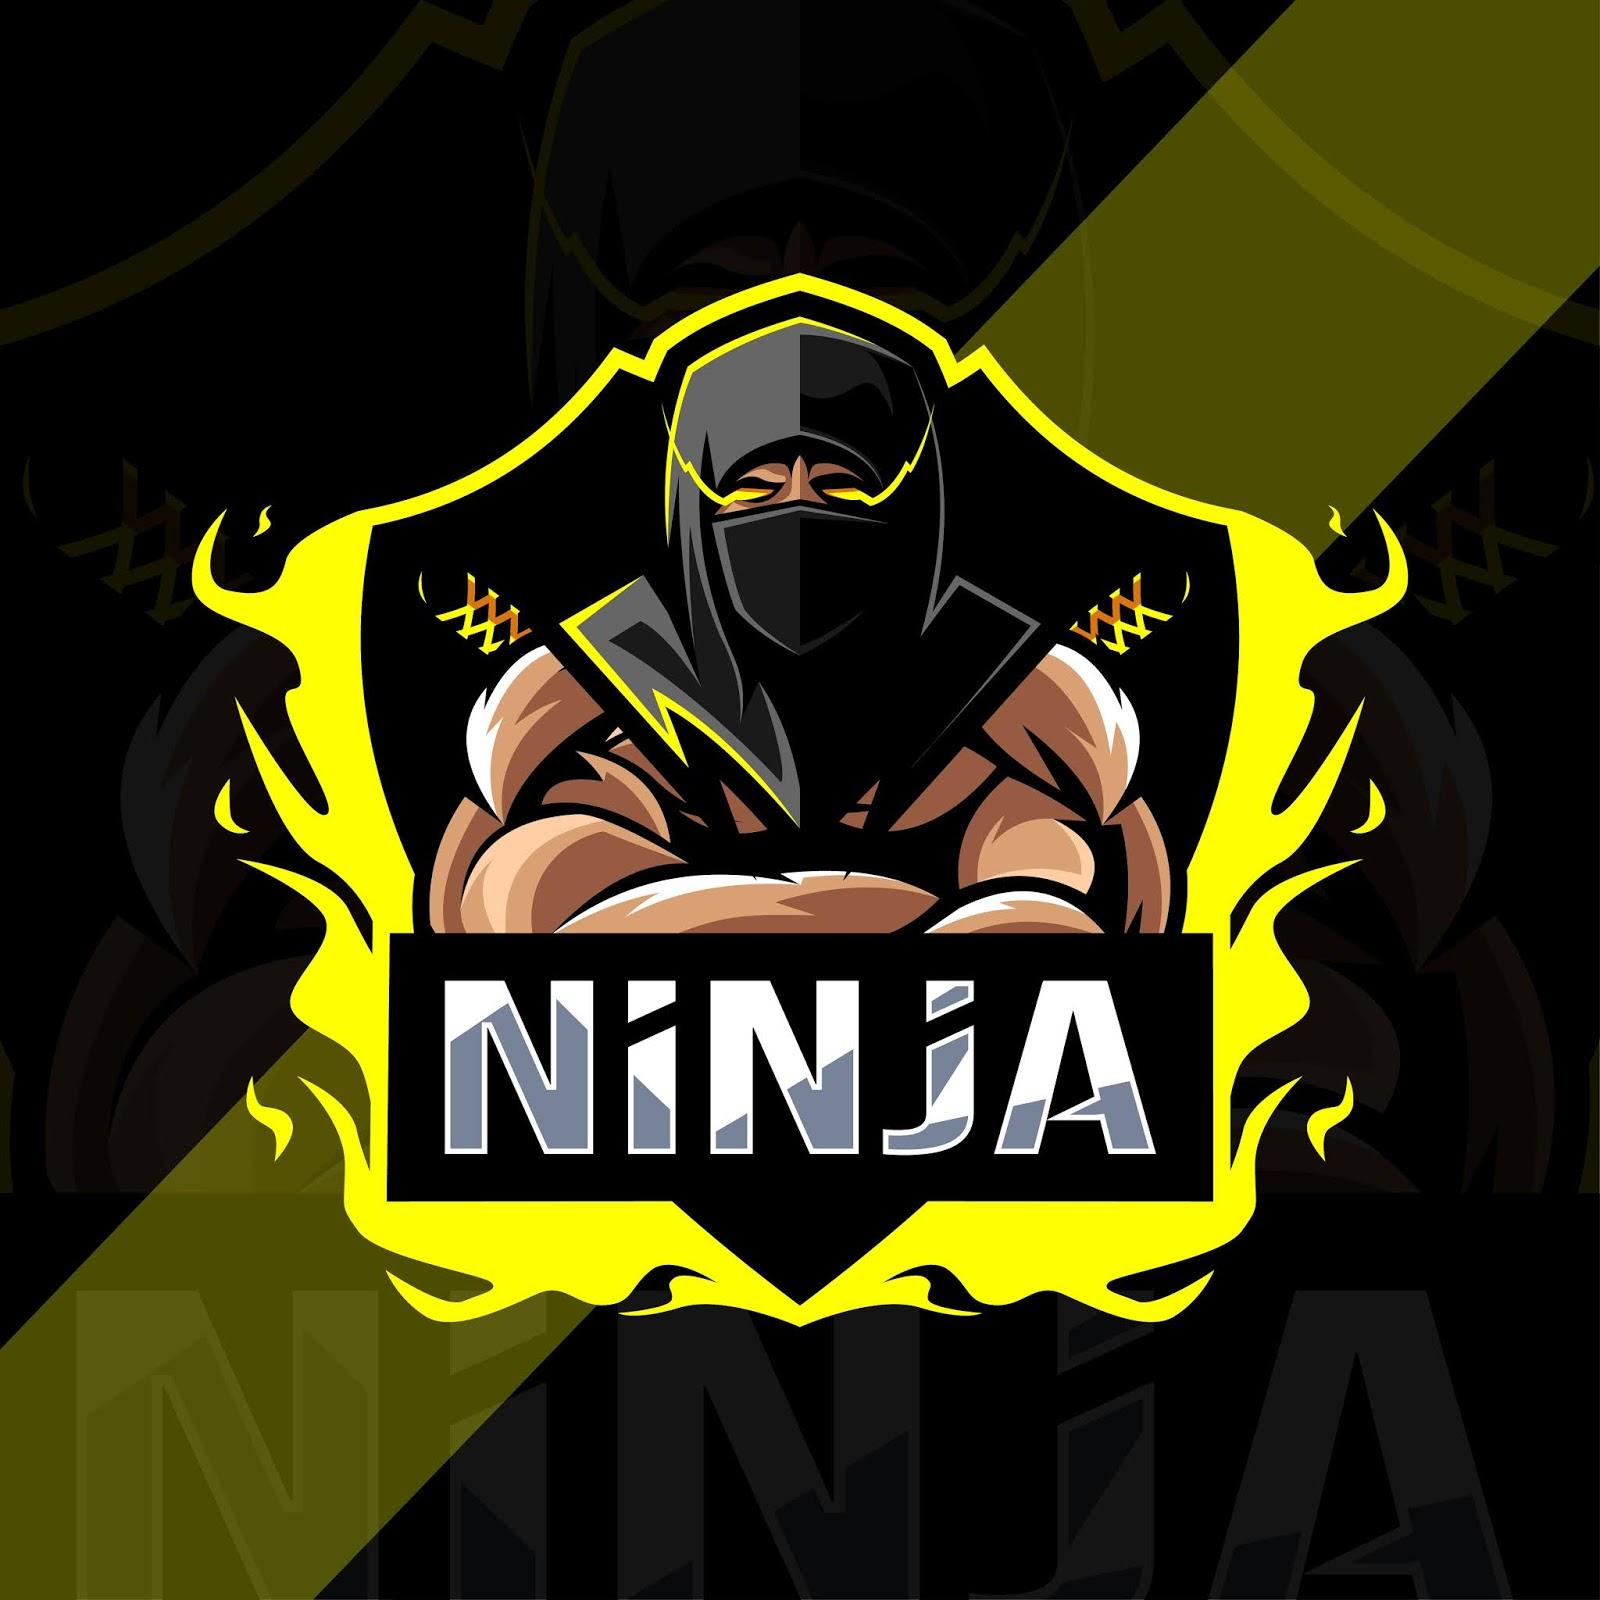 Ninja Mascot Logo Esport Design Free Download Vector CDR, AI, EPS and PNG Formats